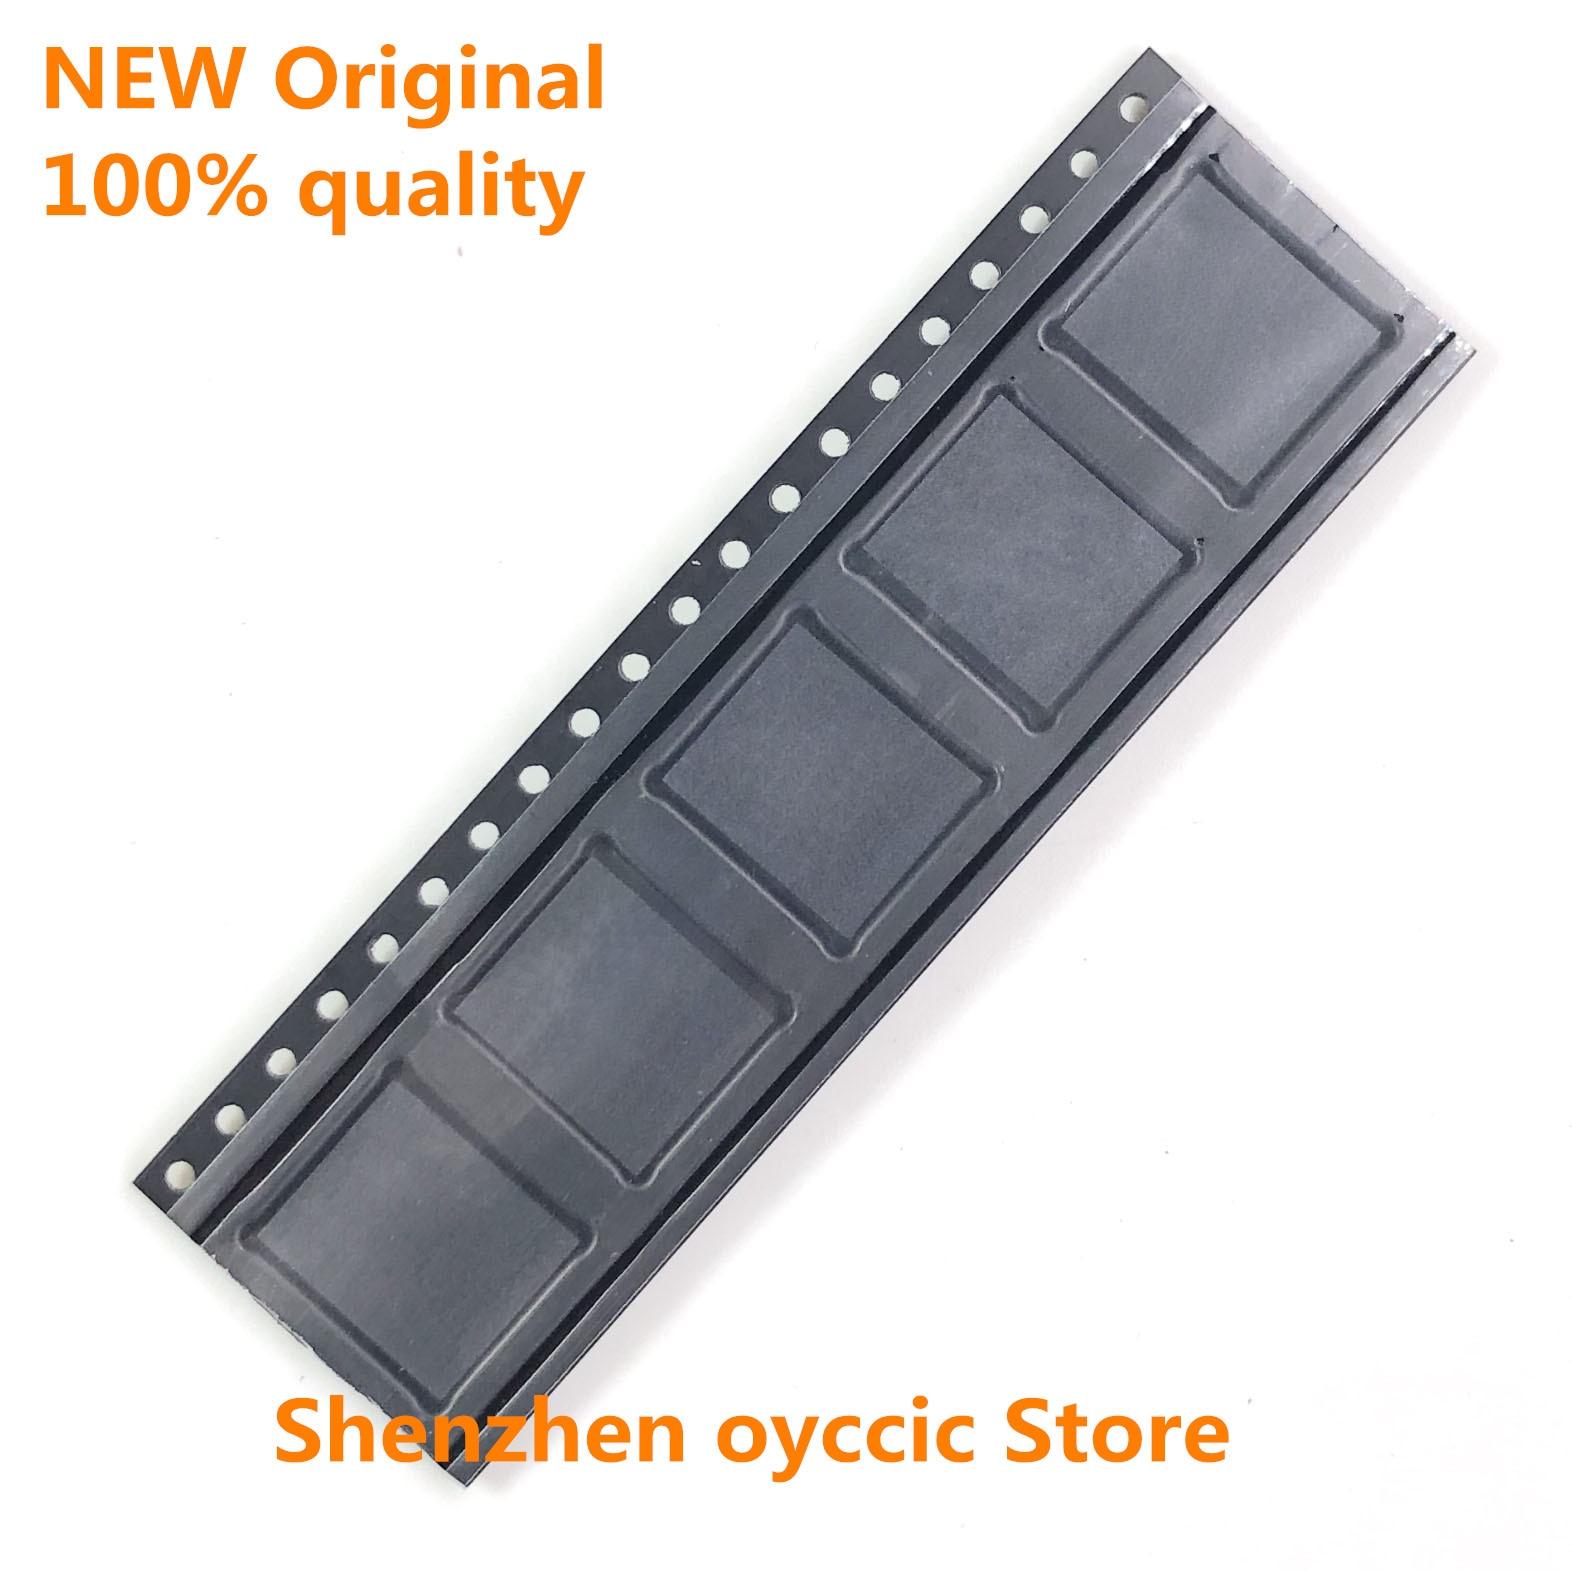 10 Uds * Nuevo BM1387B QFN IC Chipset